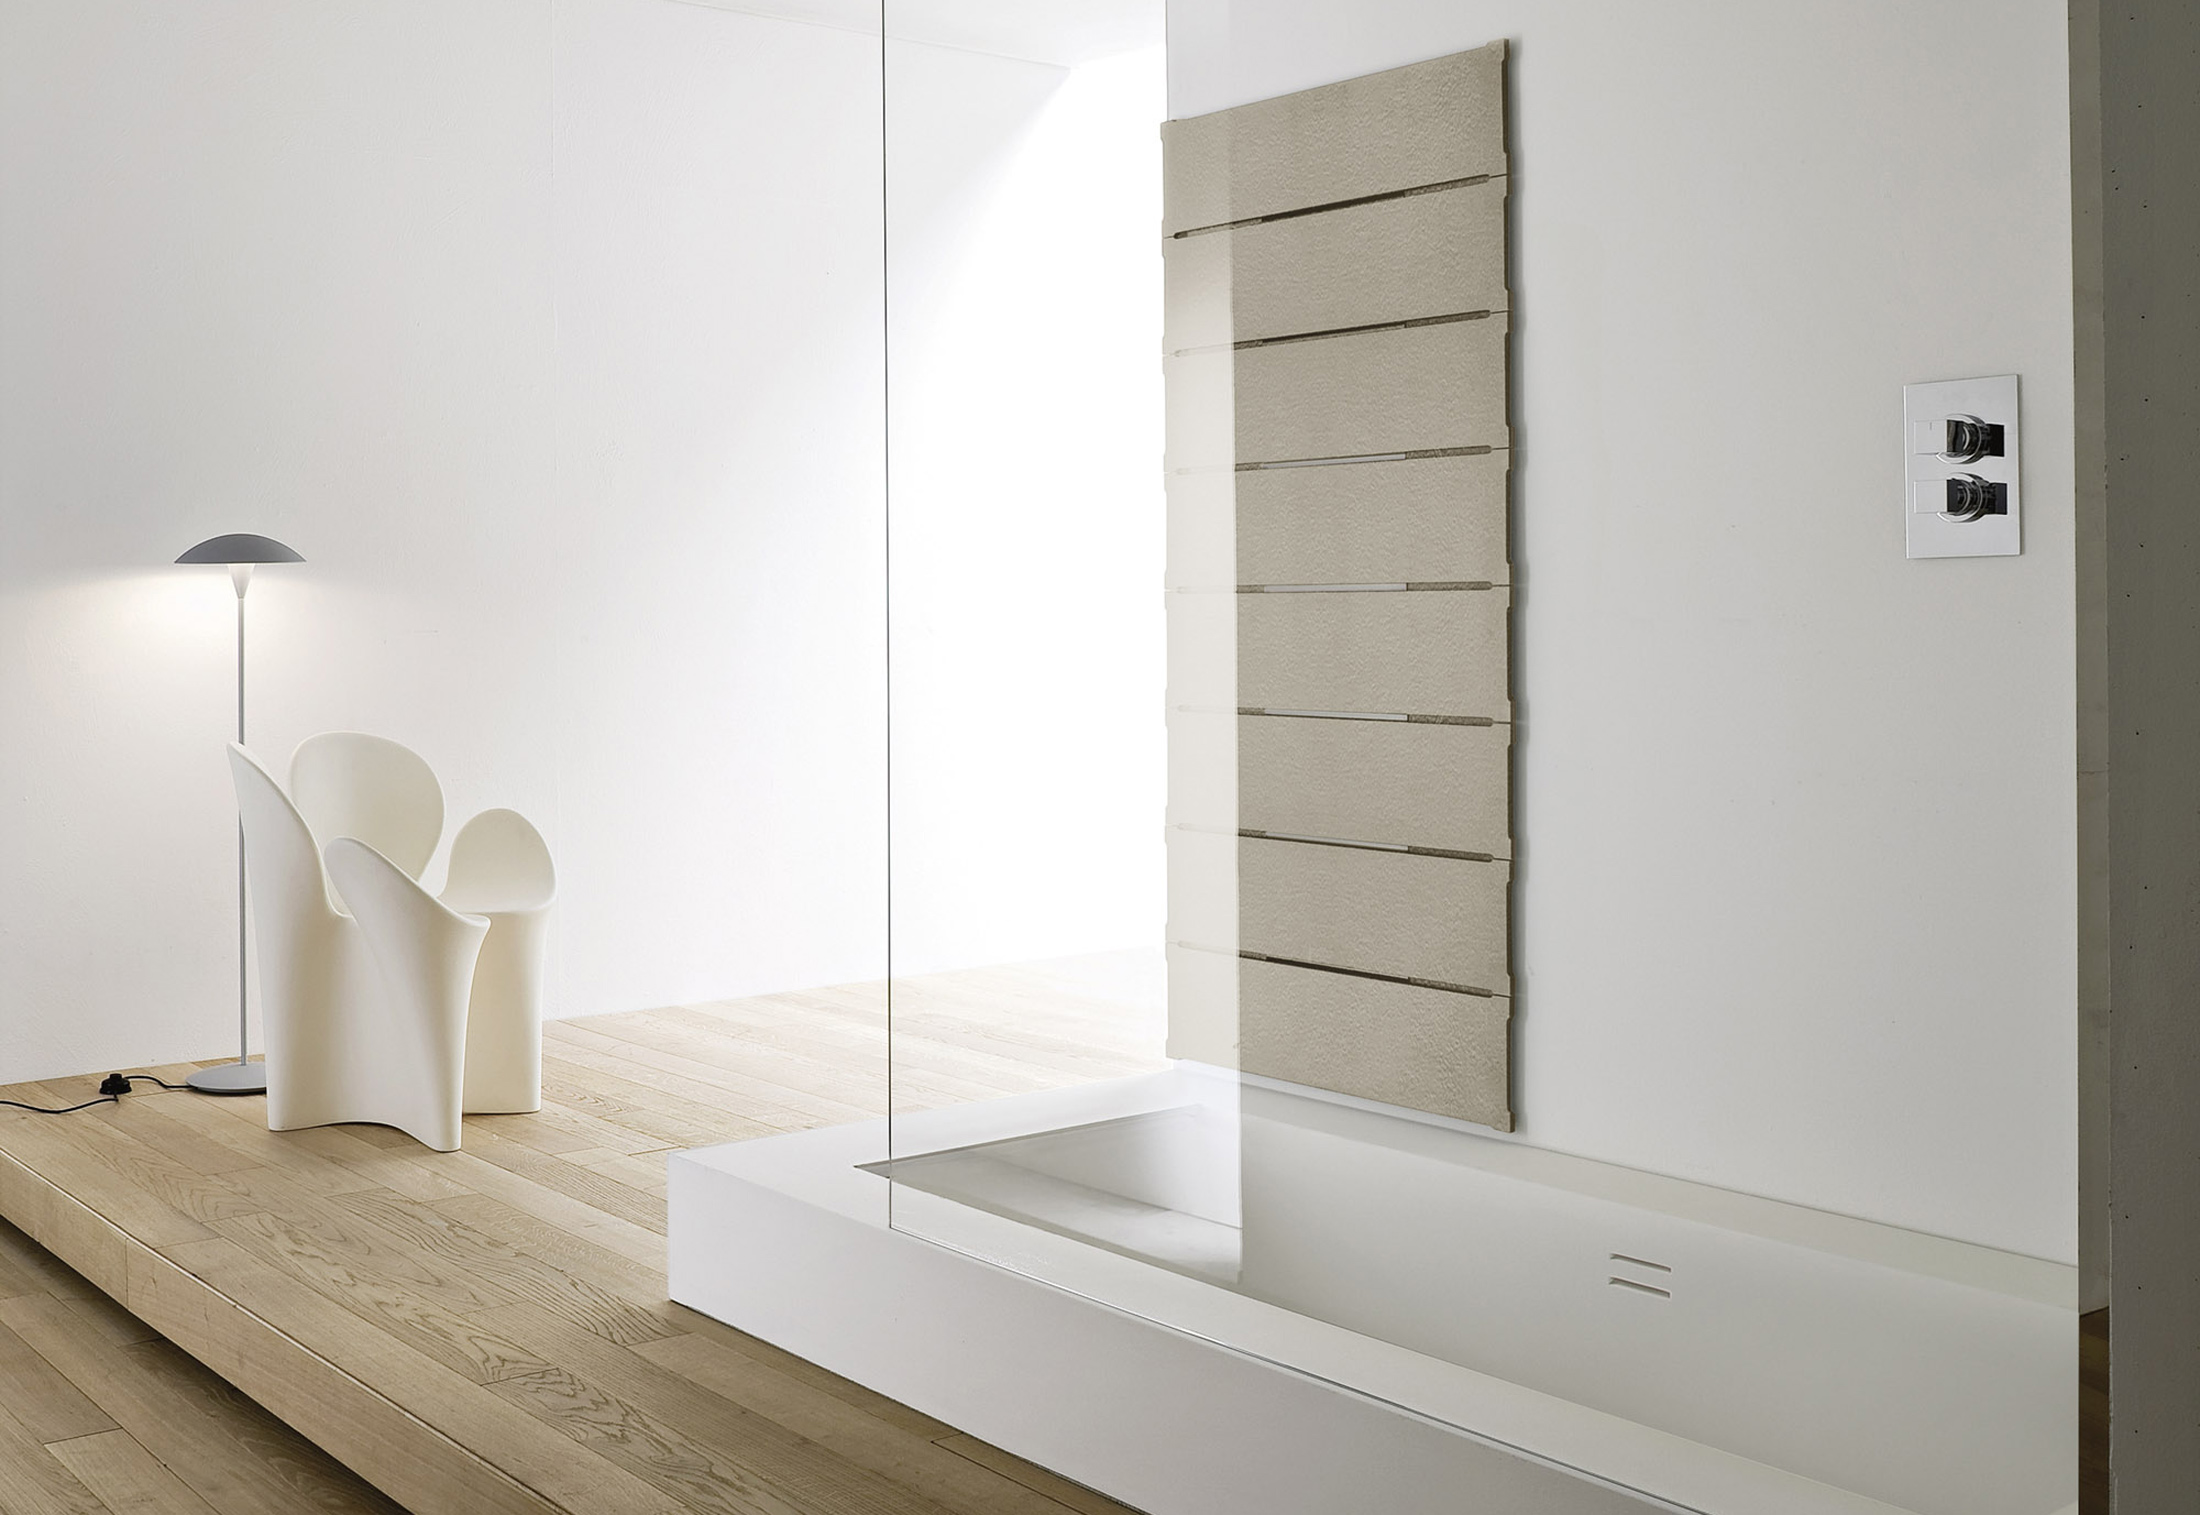 Unico Bathtub Shower System By Rexa Design